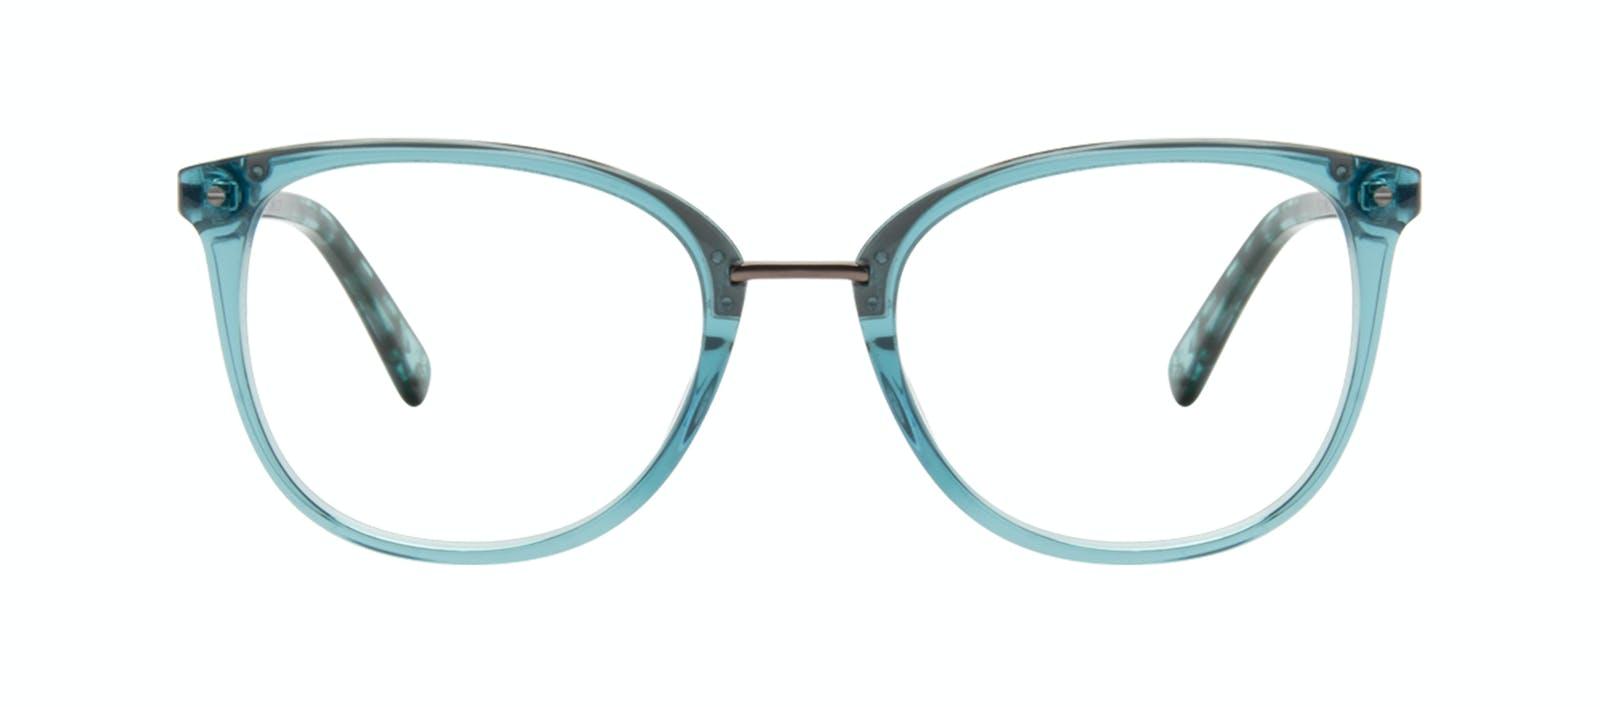 06b94d5ff6 Affordable Fashion Glasses Square Round Eyeglasses Women Bella Teal Front